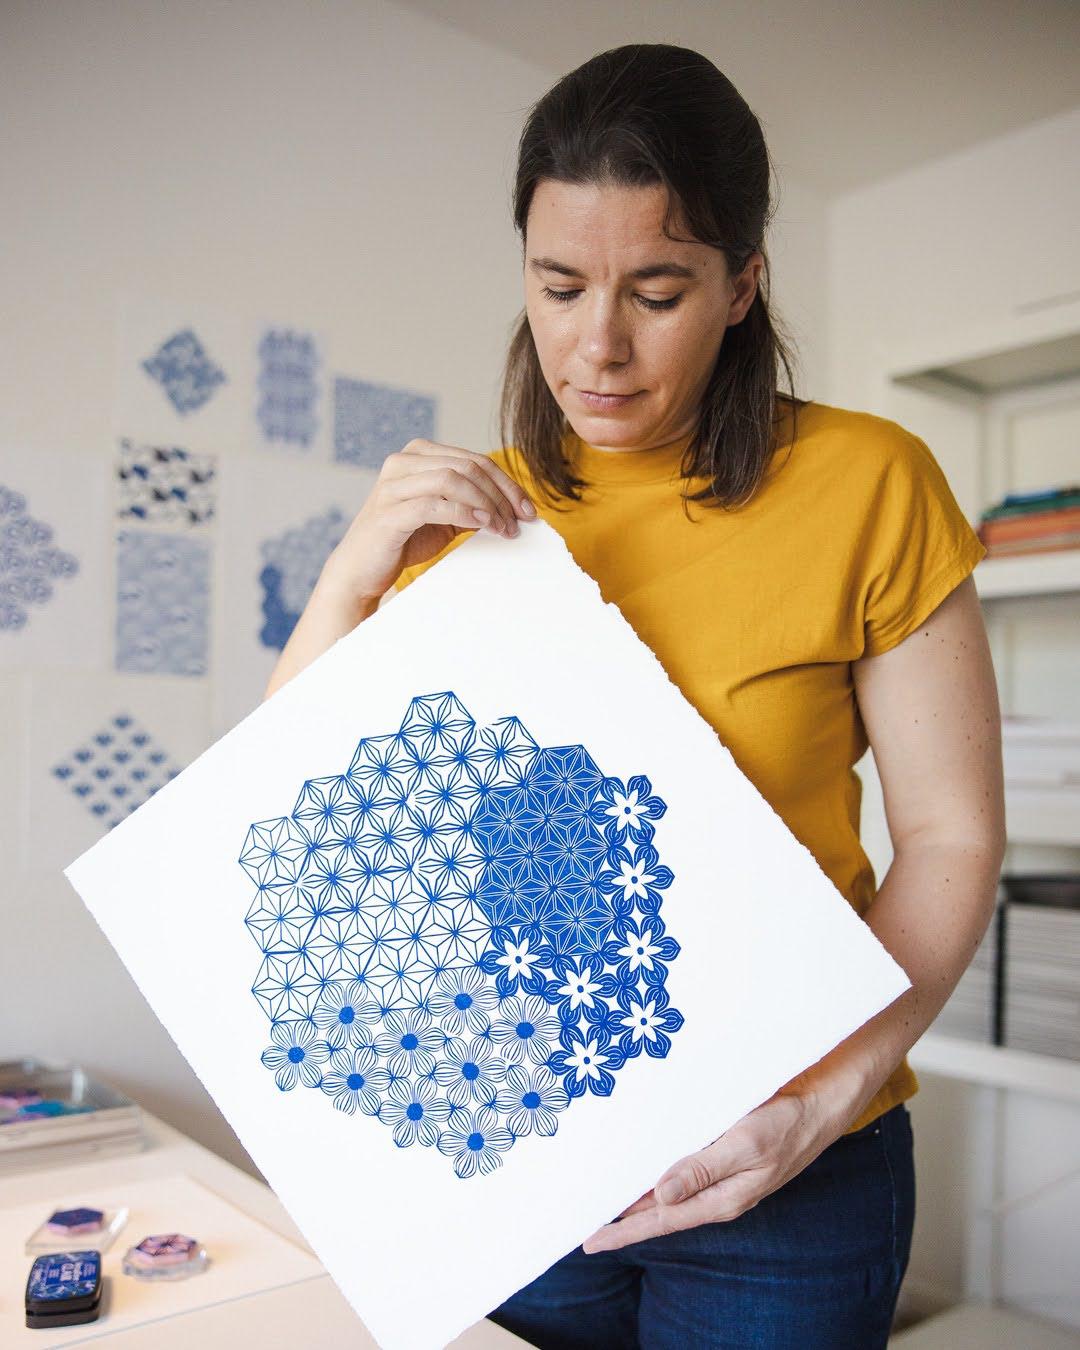 3dottedpenguins Ali printmaker surfacedesigner blockprinting studio_0198